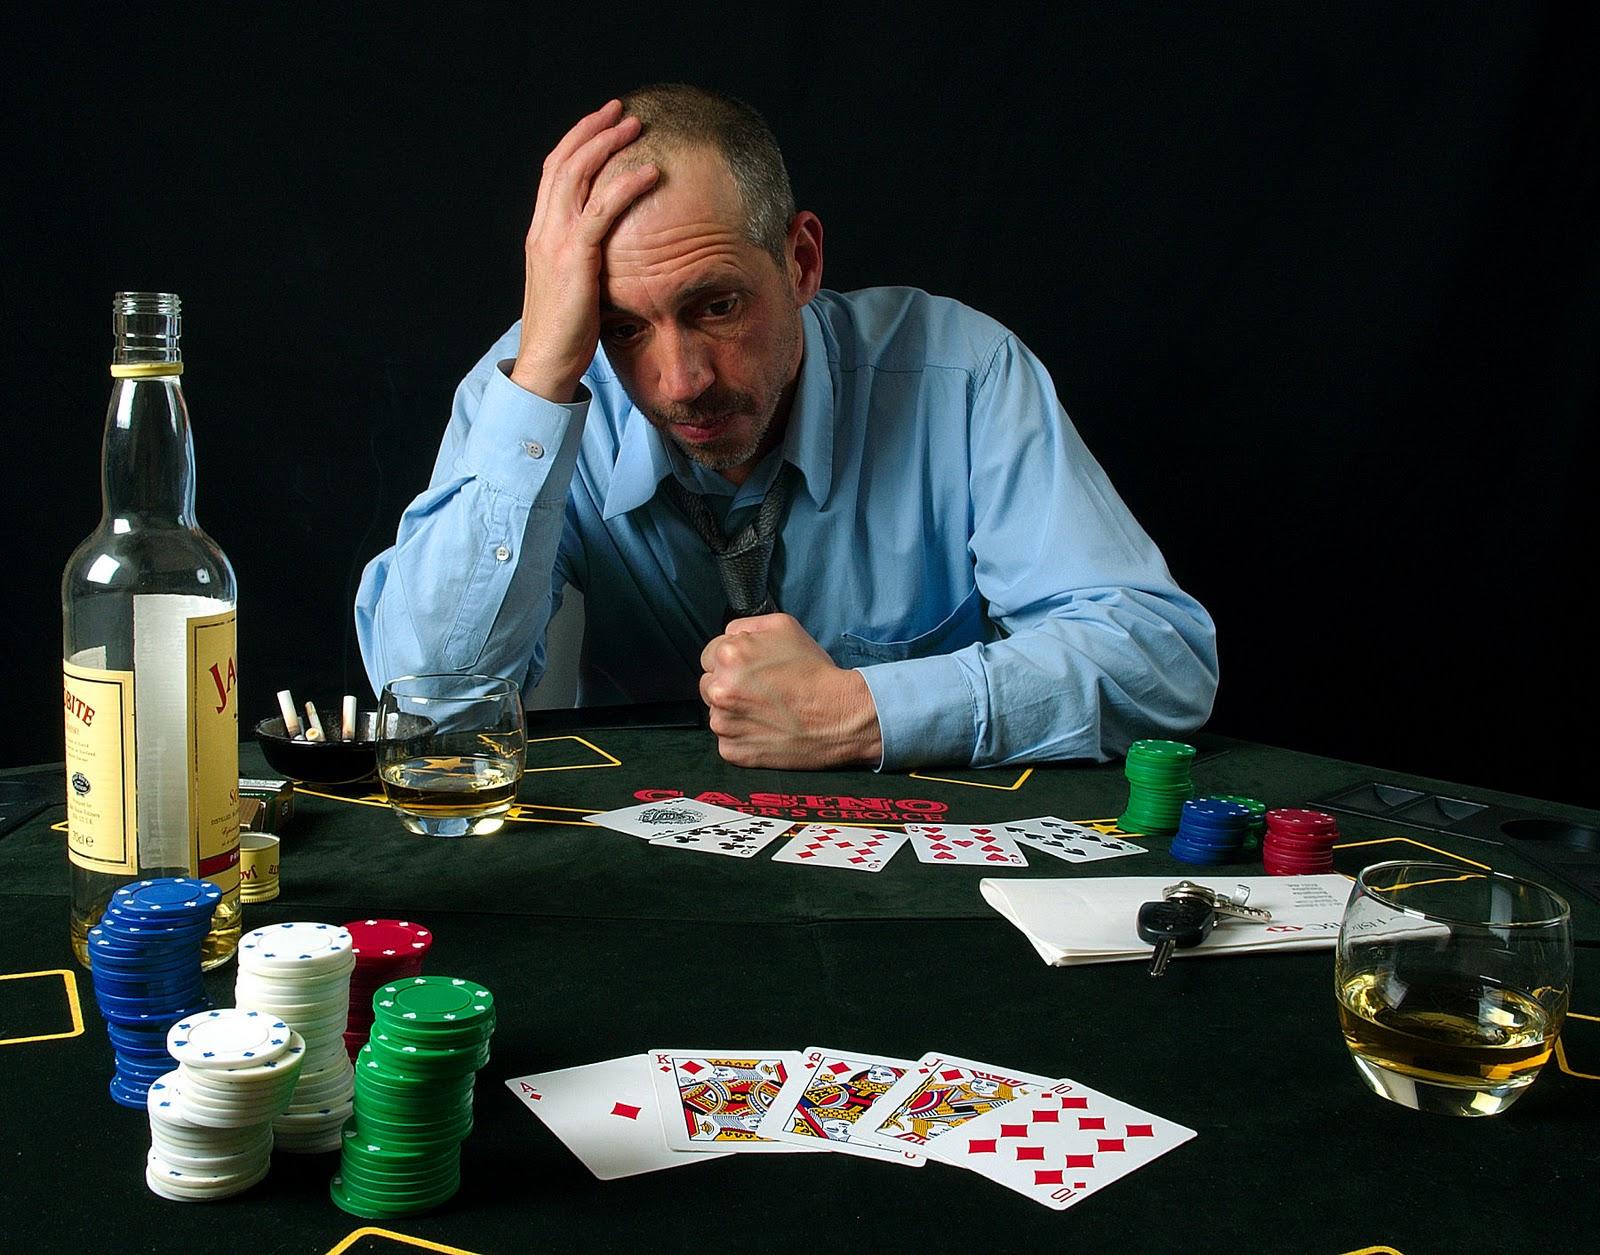 Gambling addiction poverty